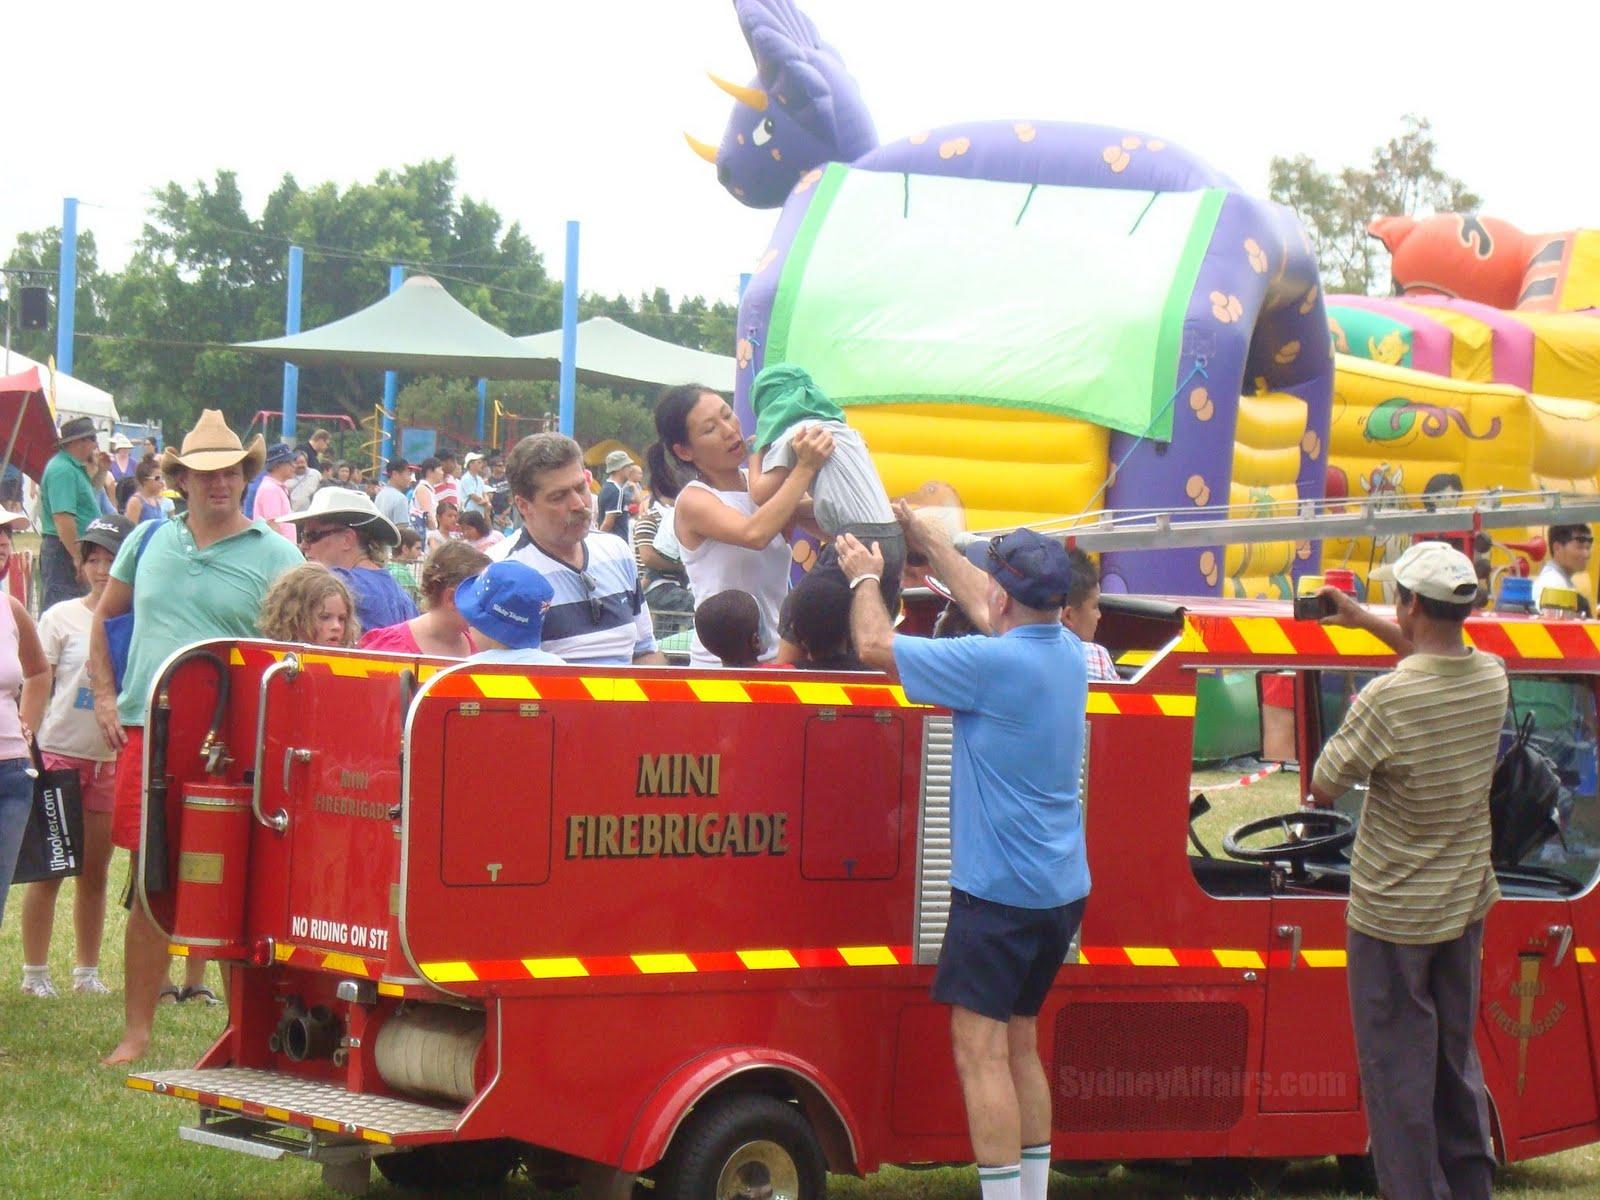 Australia Day 2011 Celebrations 12 Photos